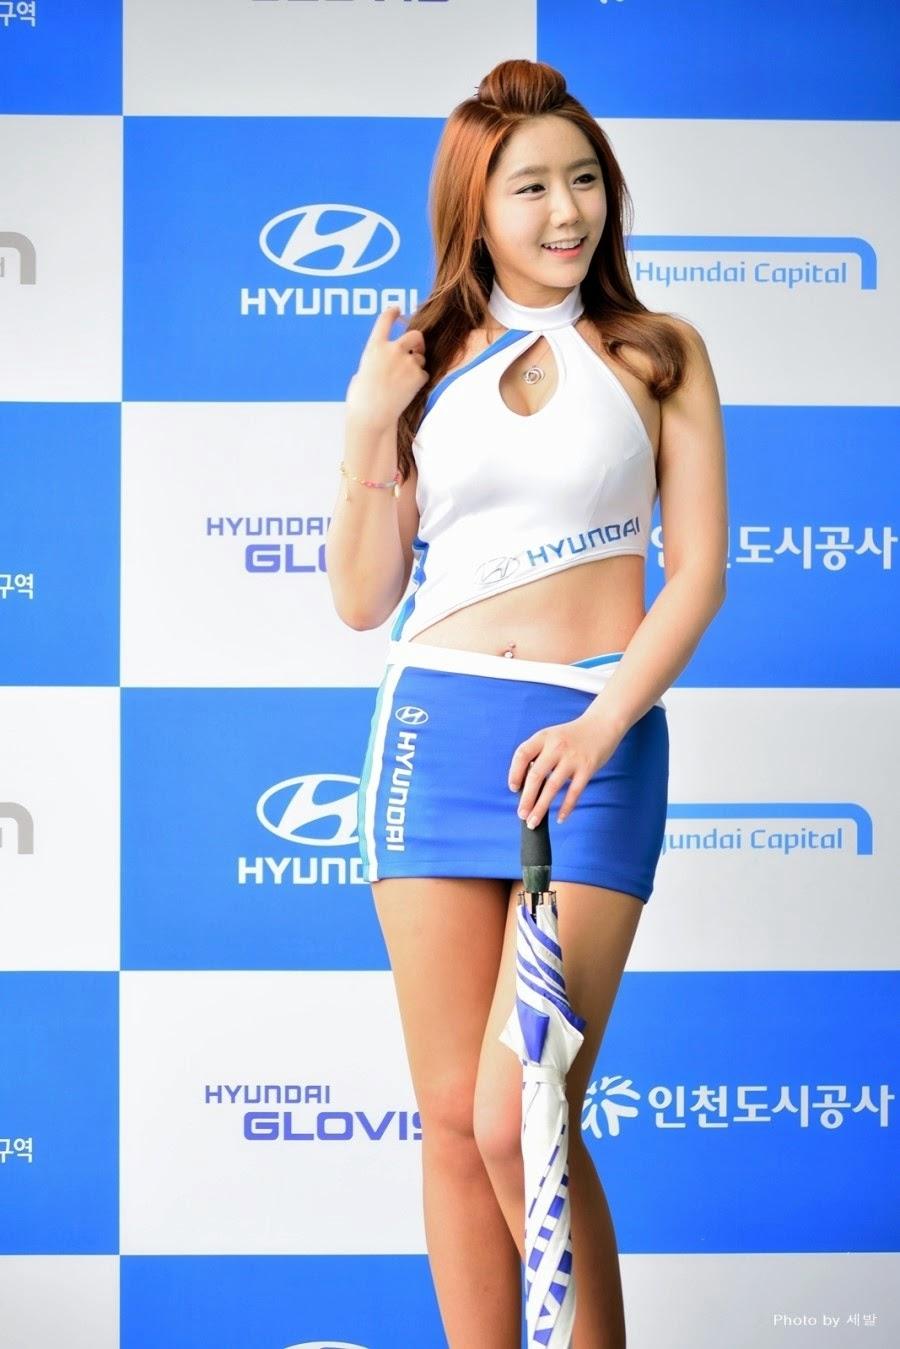 3 Kim Ha Eum - Korea Speed Festival 2014 - very cute asian girl-girlcute4u.blogspot.com